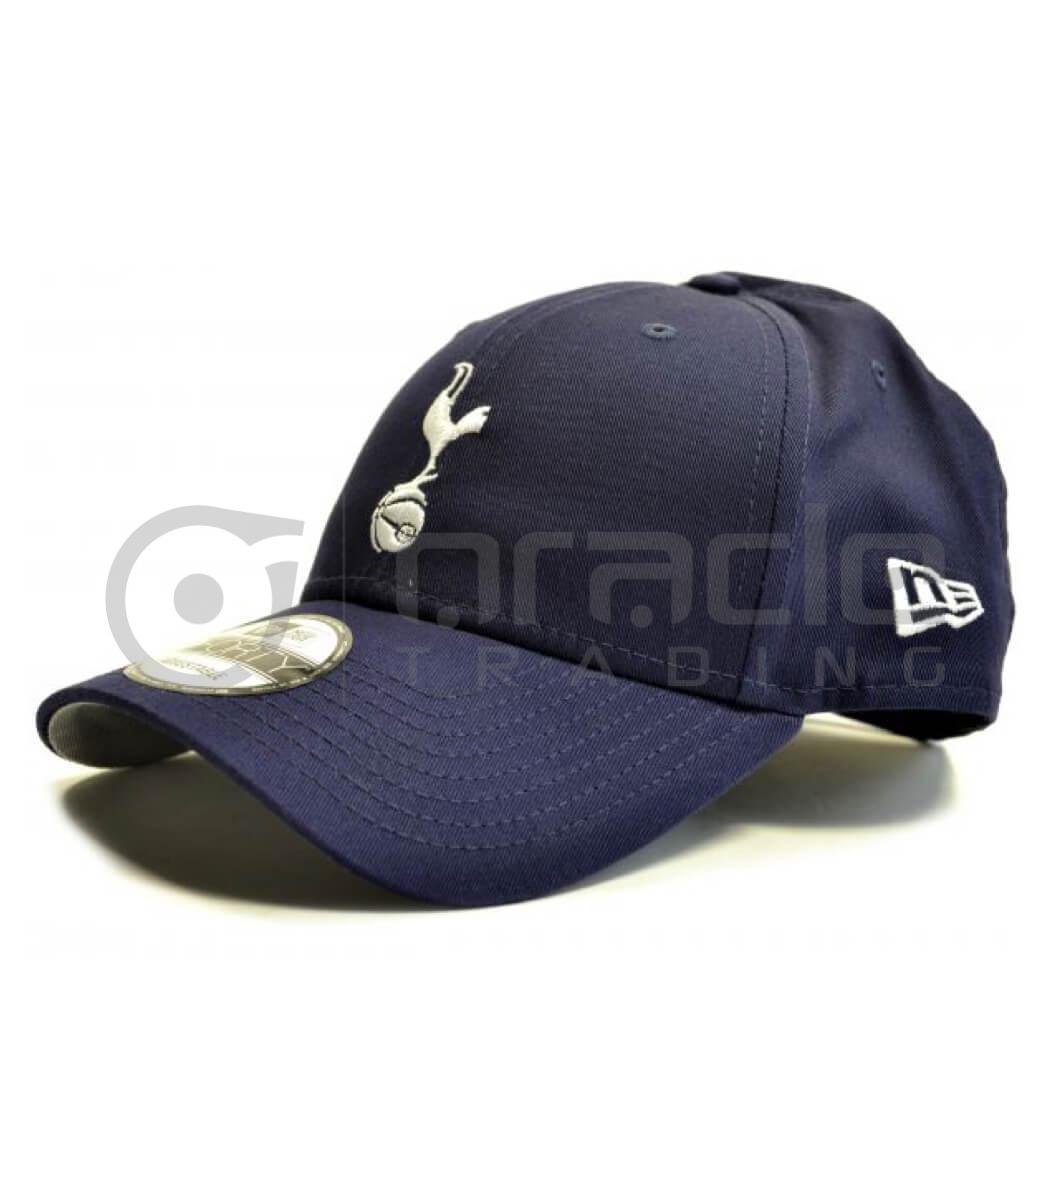 Tottenham Navy Crest Hat - New Era